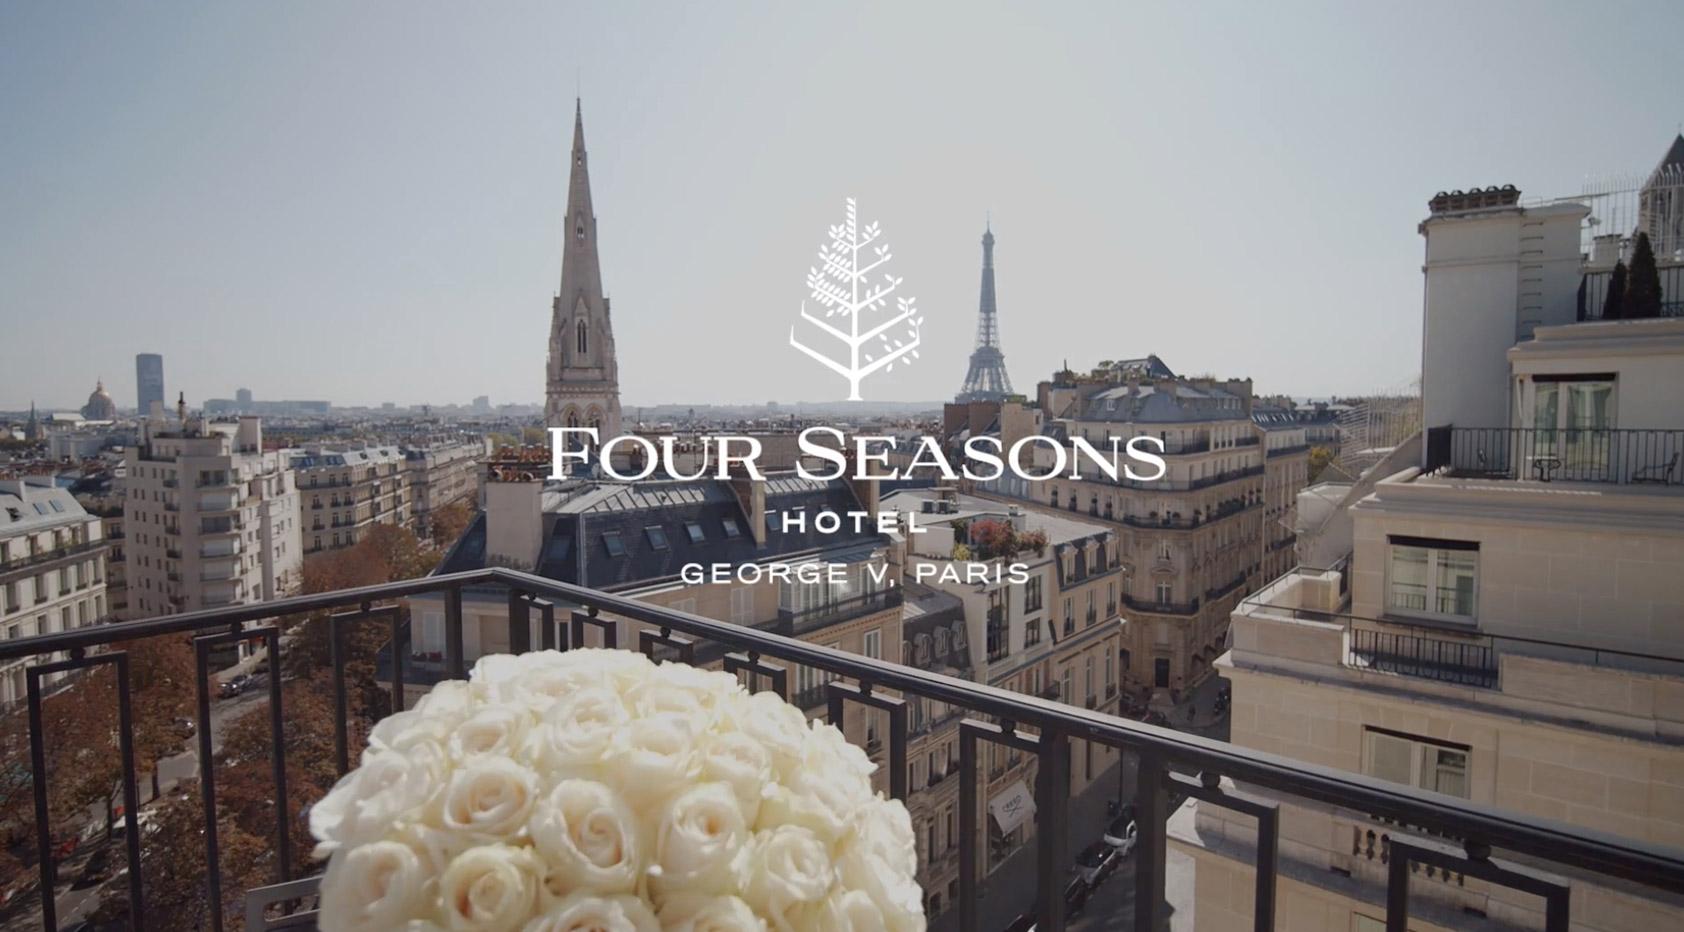 Four Seasons - Georges V